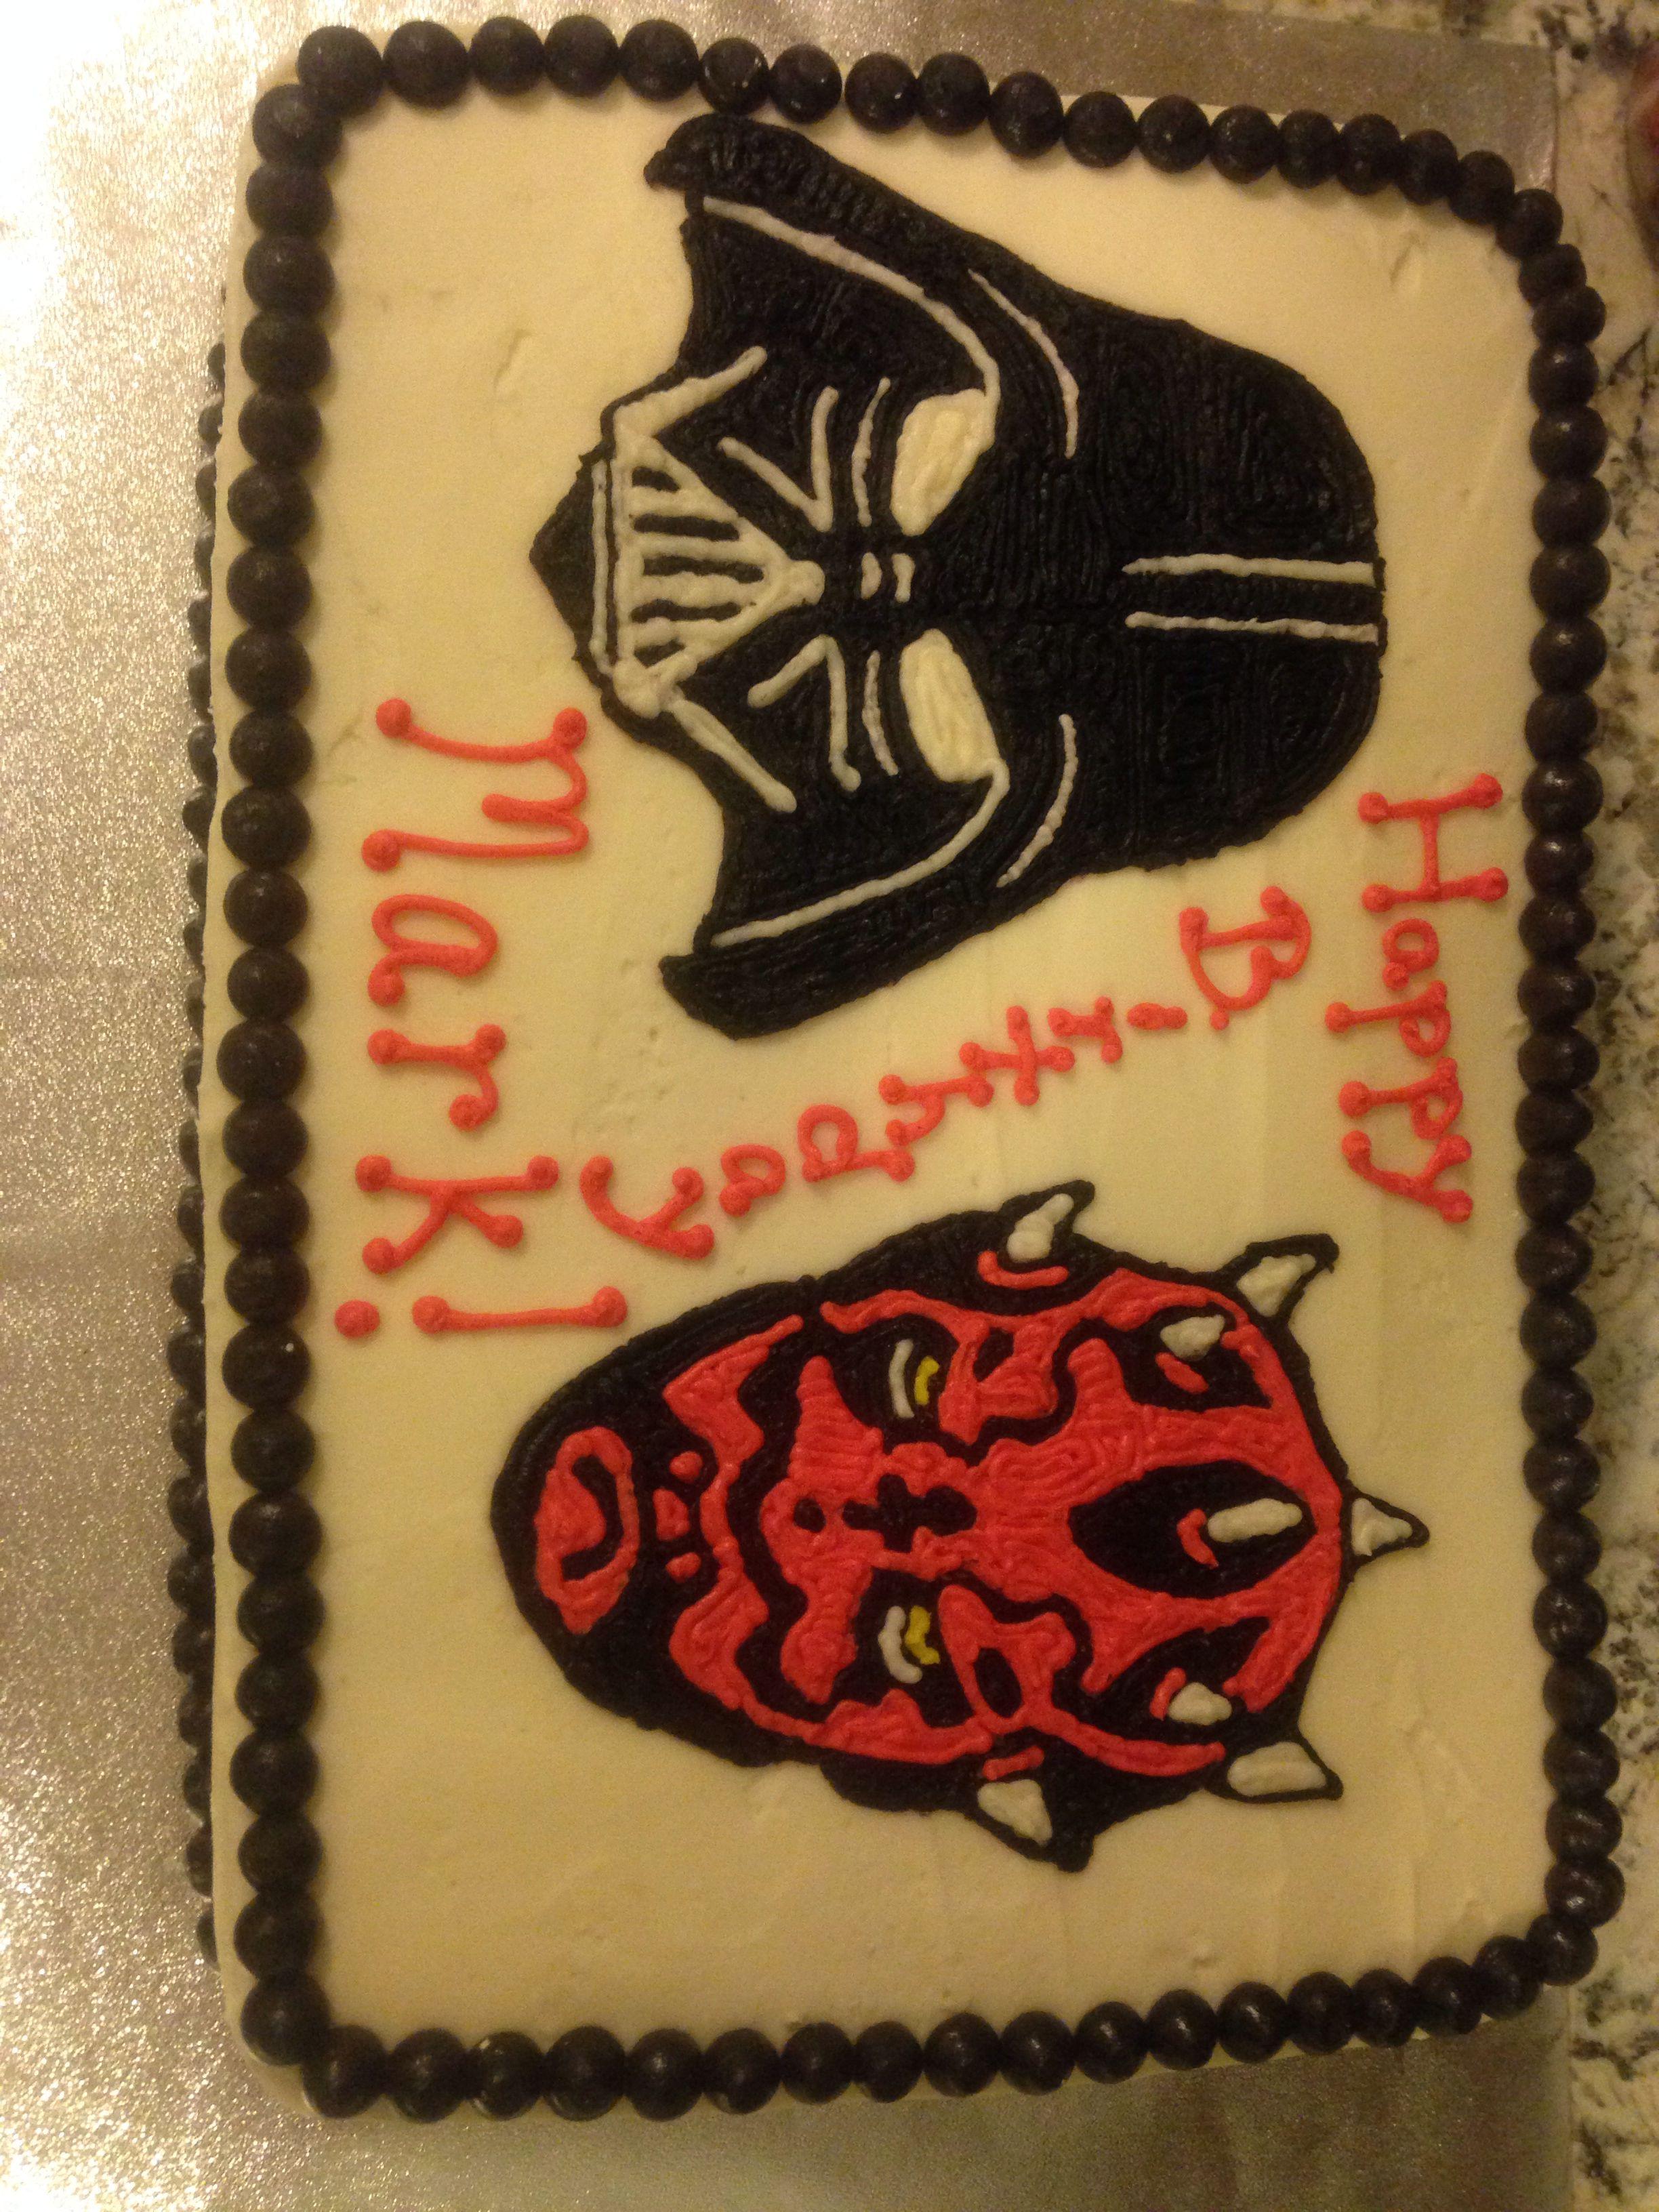 Darth Vader And Darth Maul Cake My Creations Pinterest